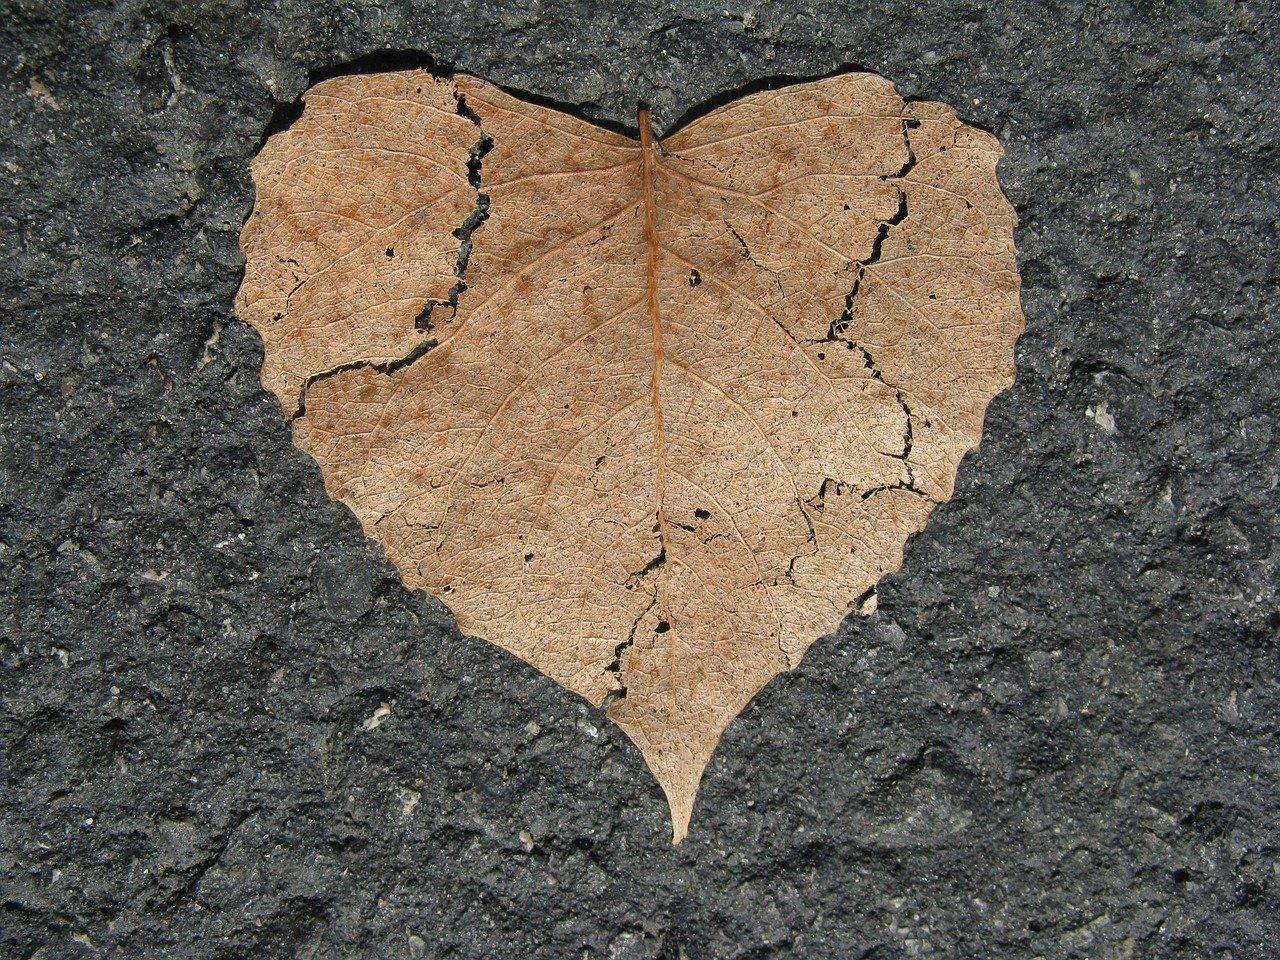 A broken heart leaf